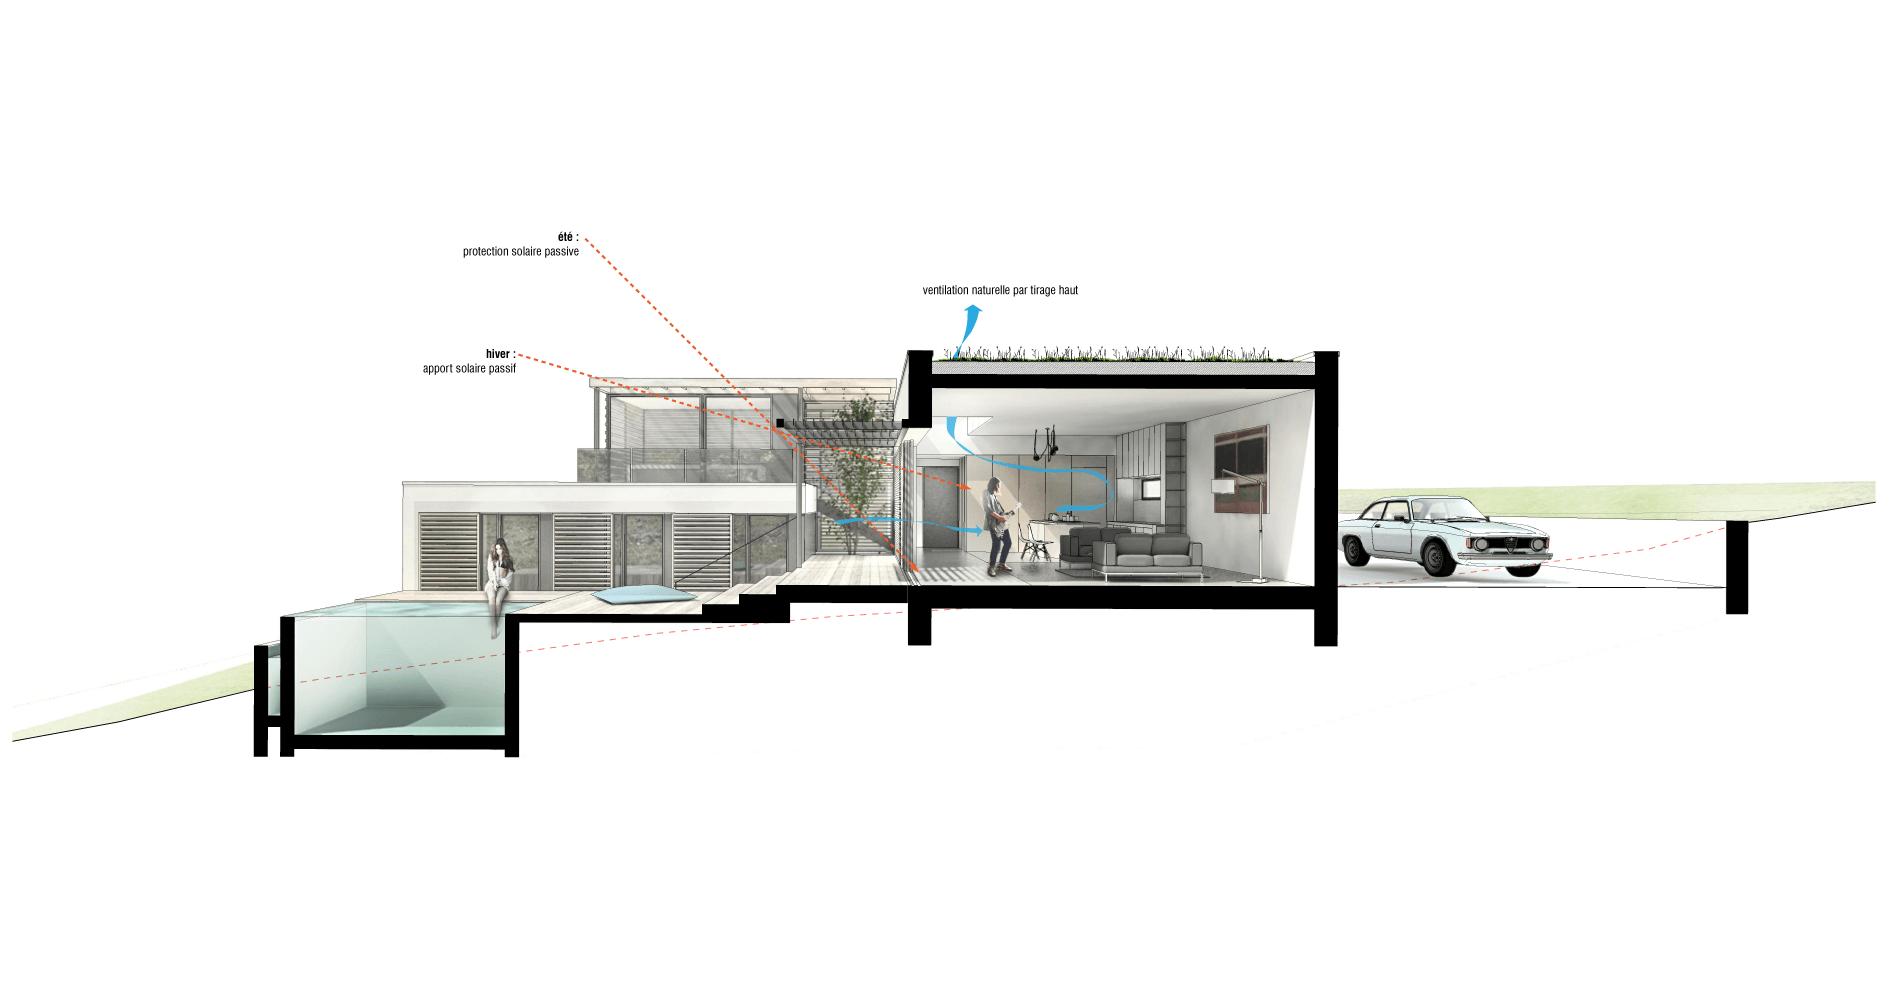 espaces morcel s asb architecture. Black Bedroom Furniture Sets. Home Design Ideas